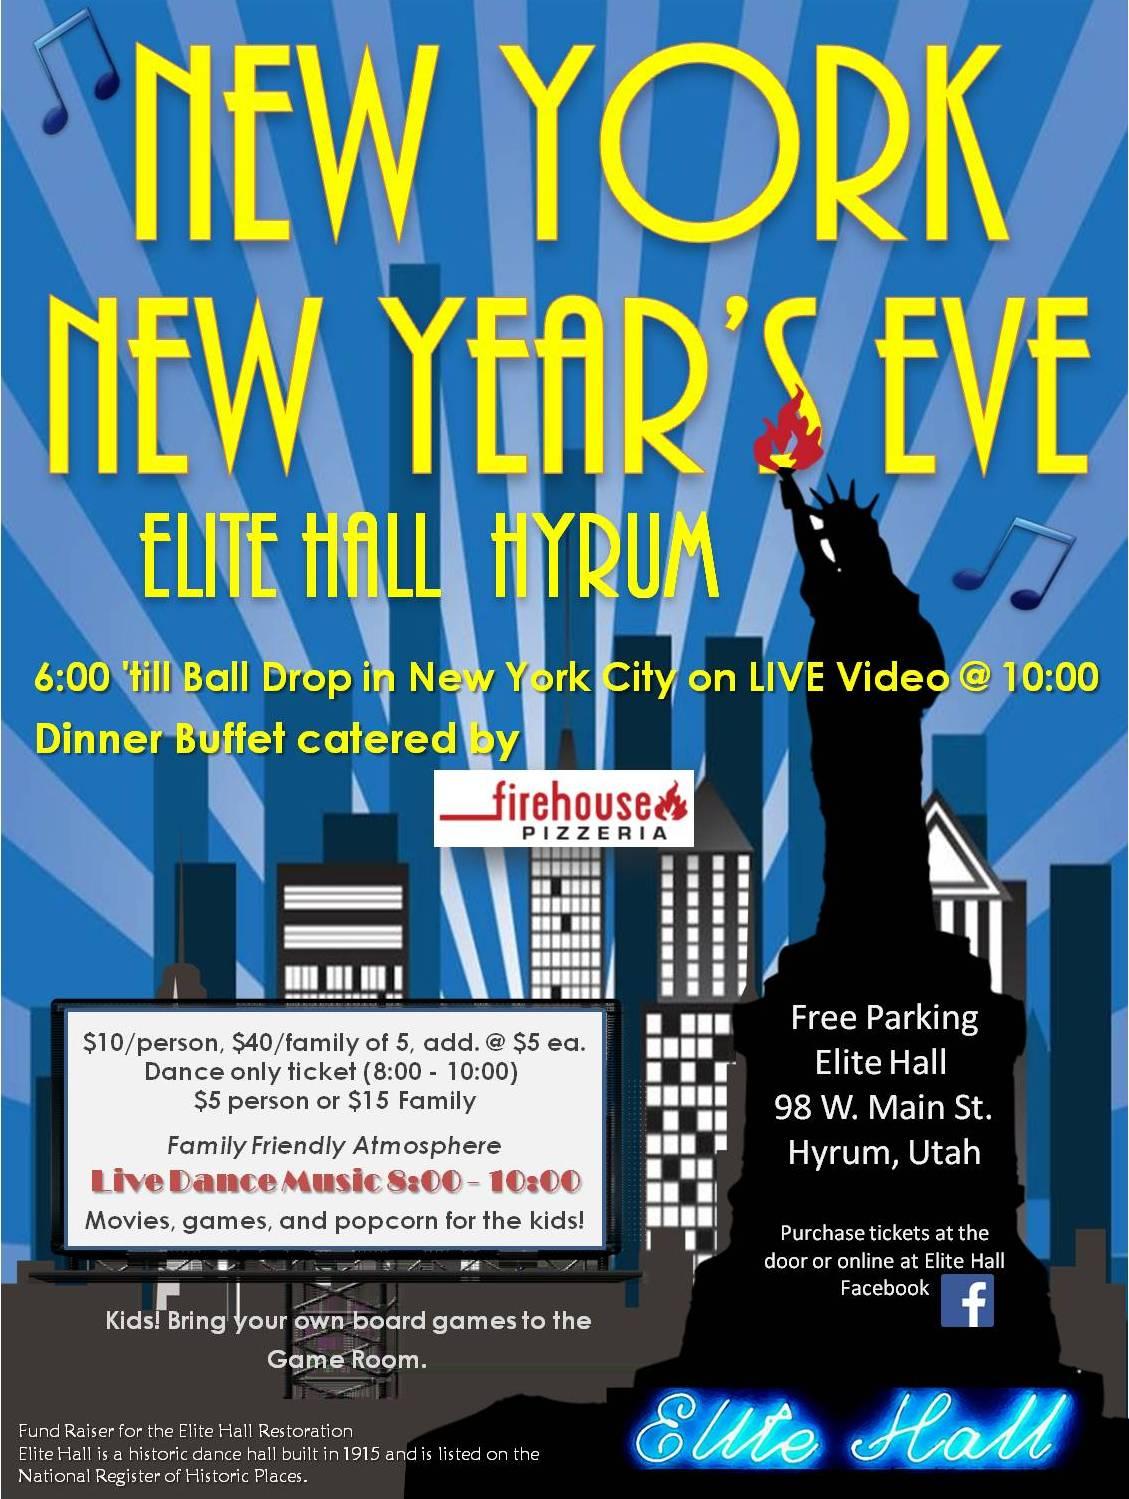 New York New Year's Eve @ Elite Hall